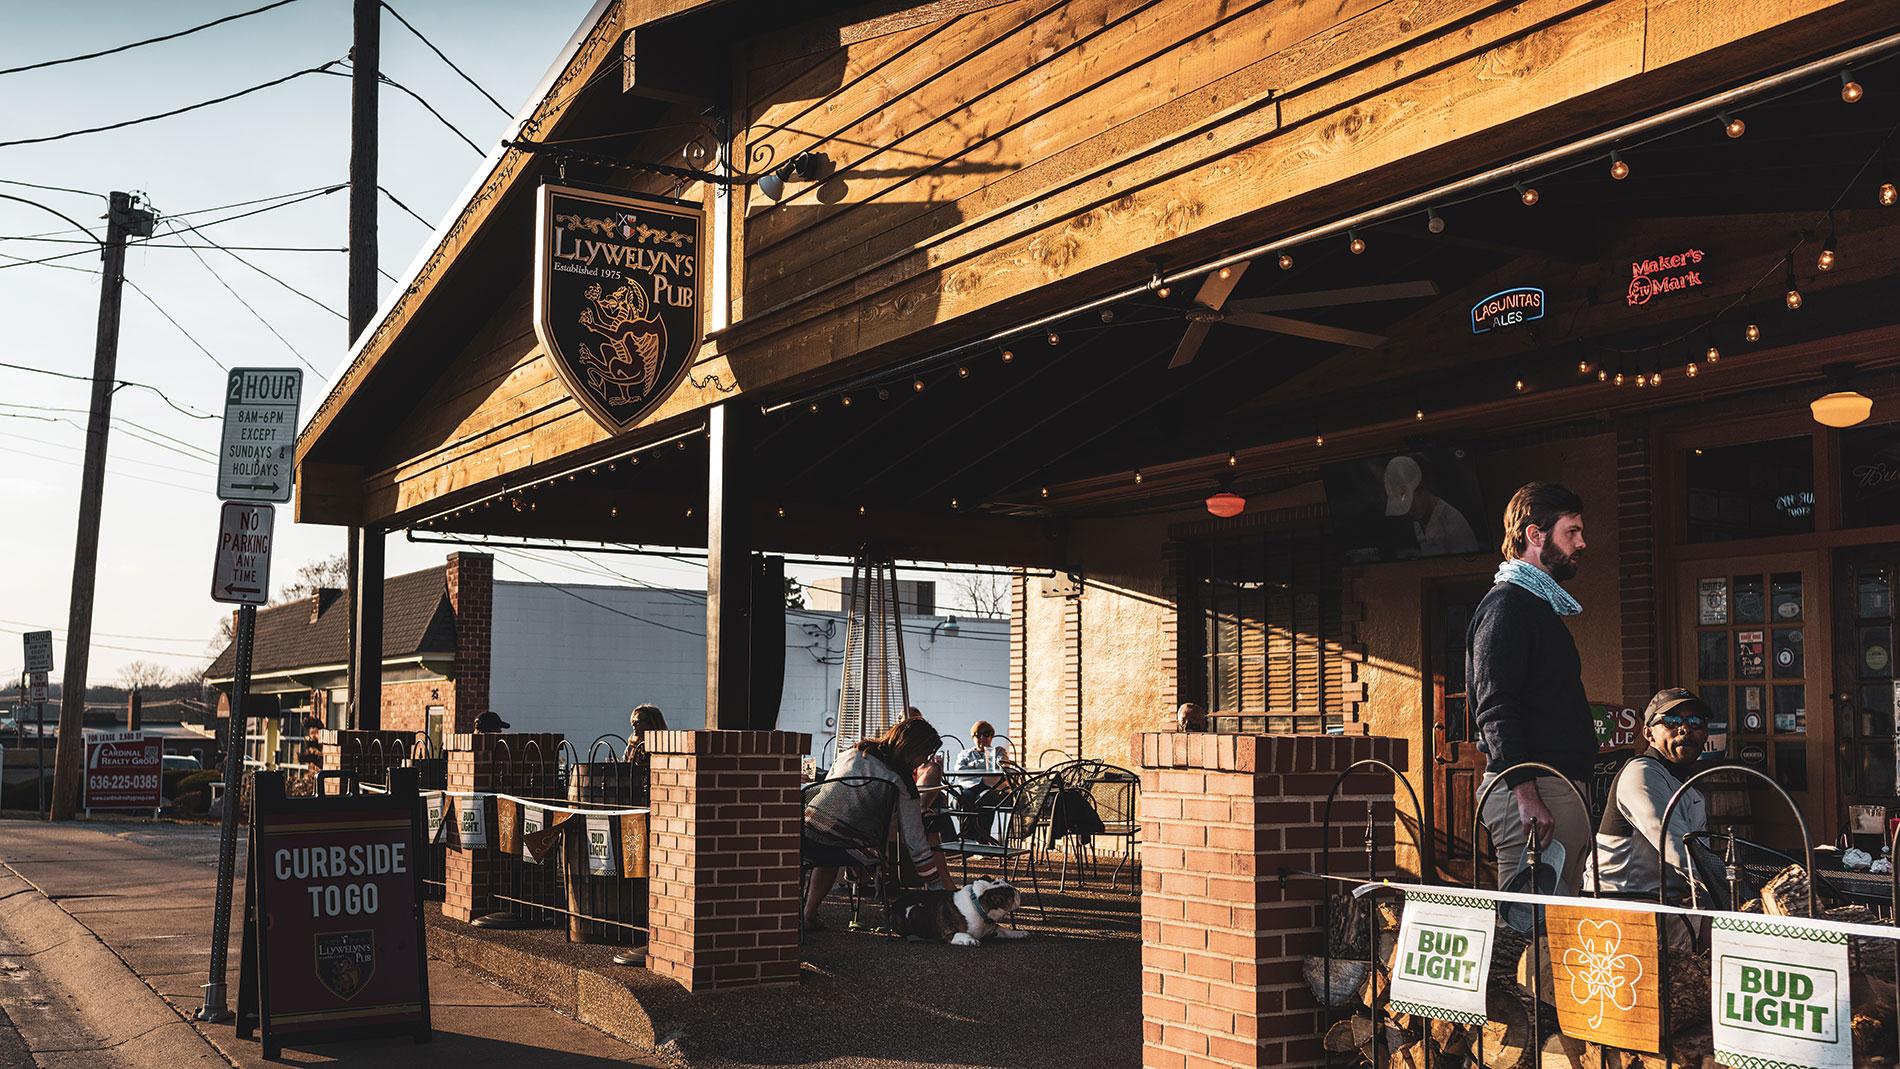 llywelyn's pub in webster groves